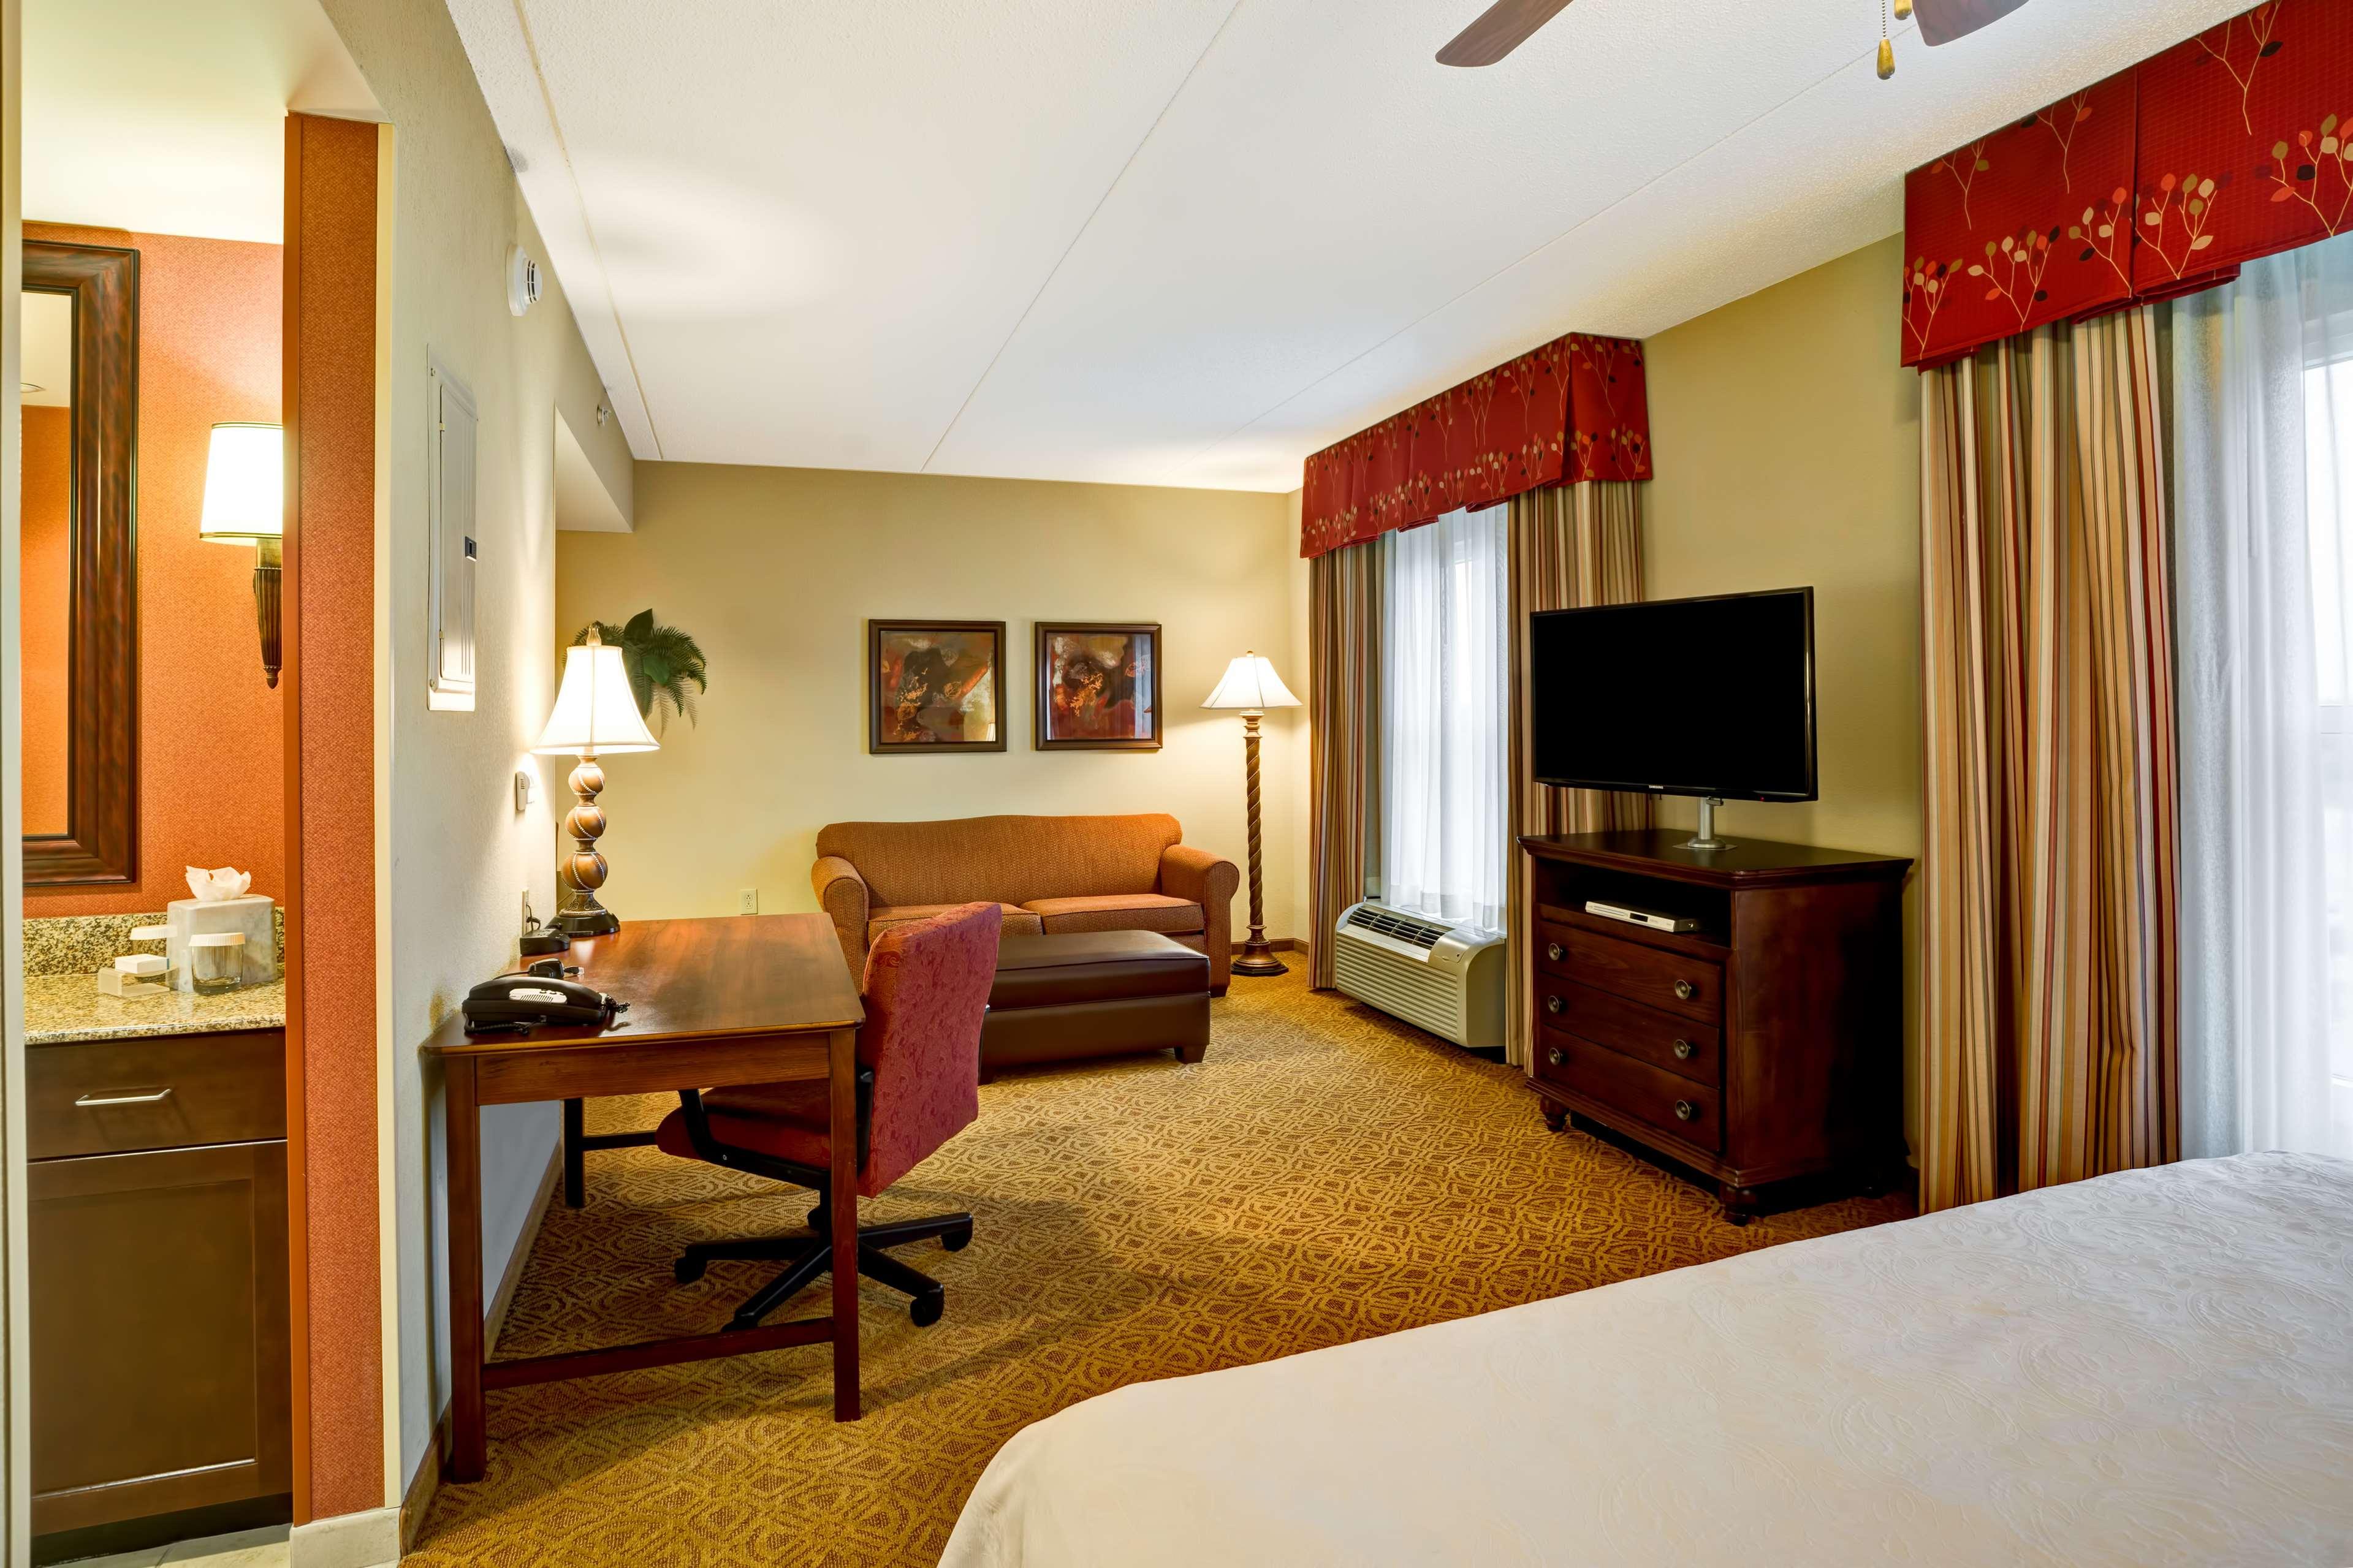 Homewood Suites by Hilton Fredericksburg image 26